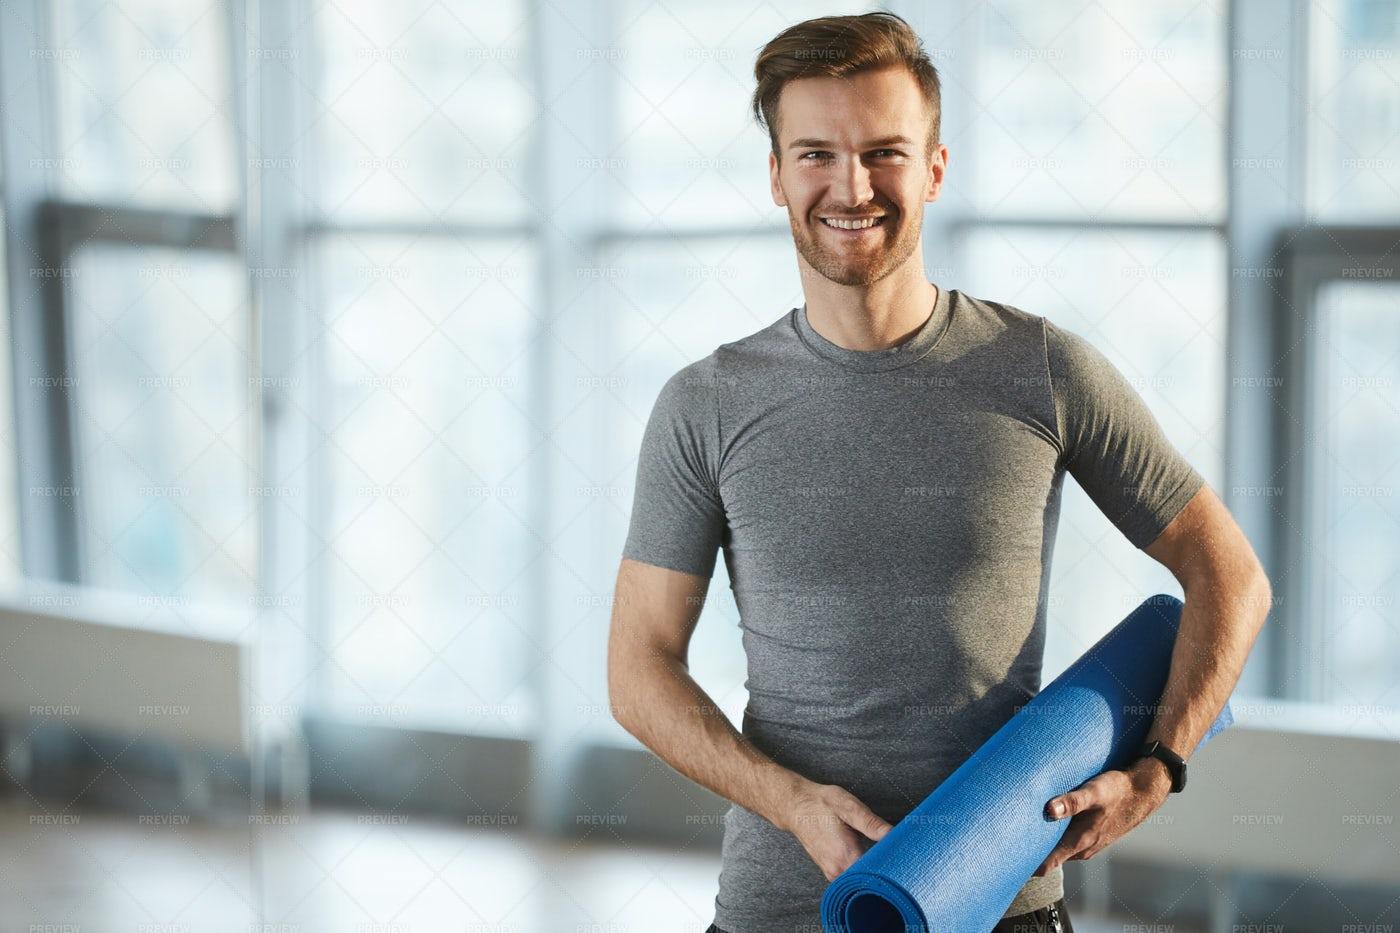 Young Yoga Coach In Own Studio: Stock Photos